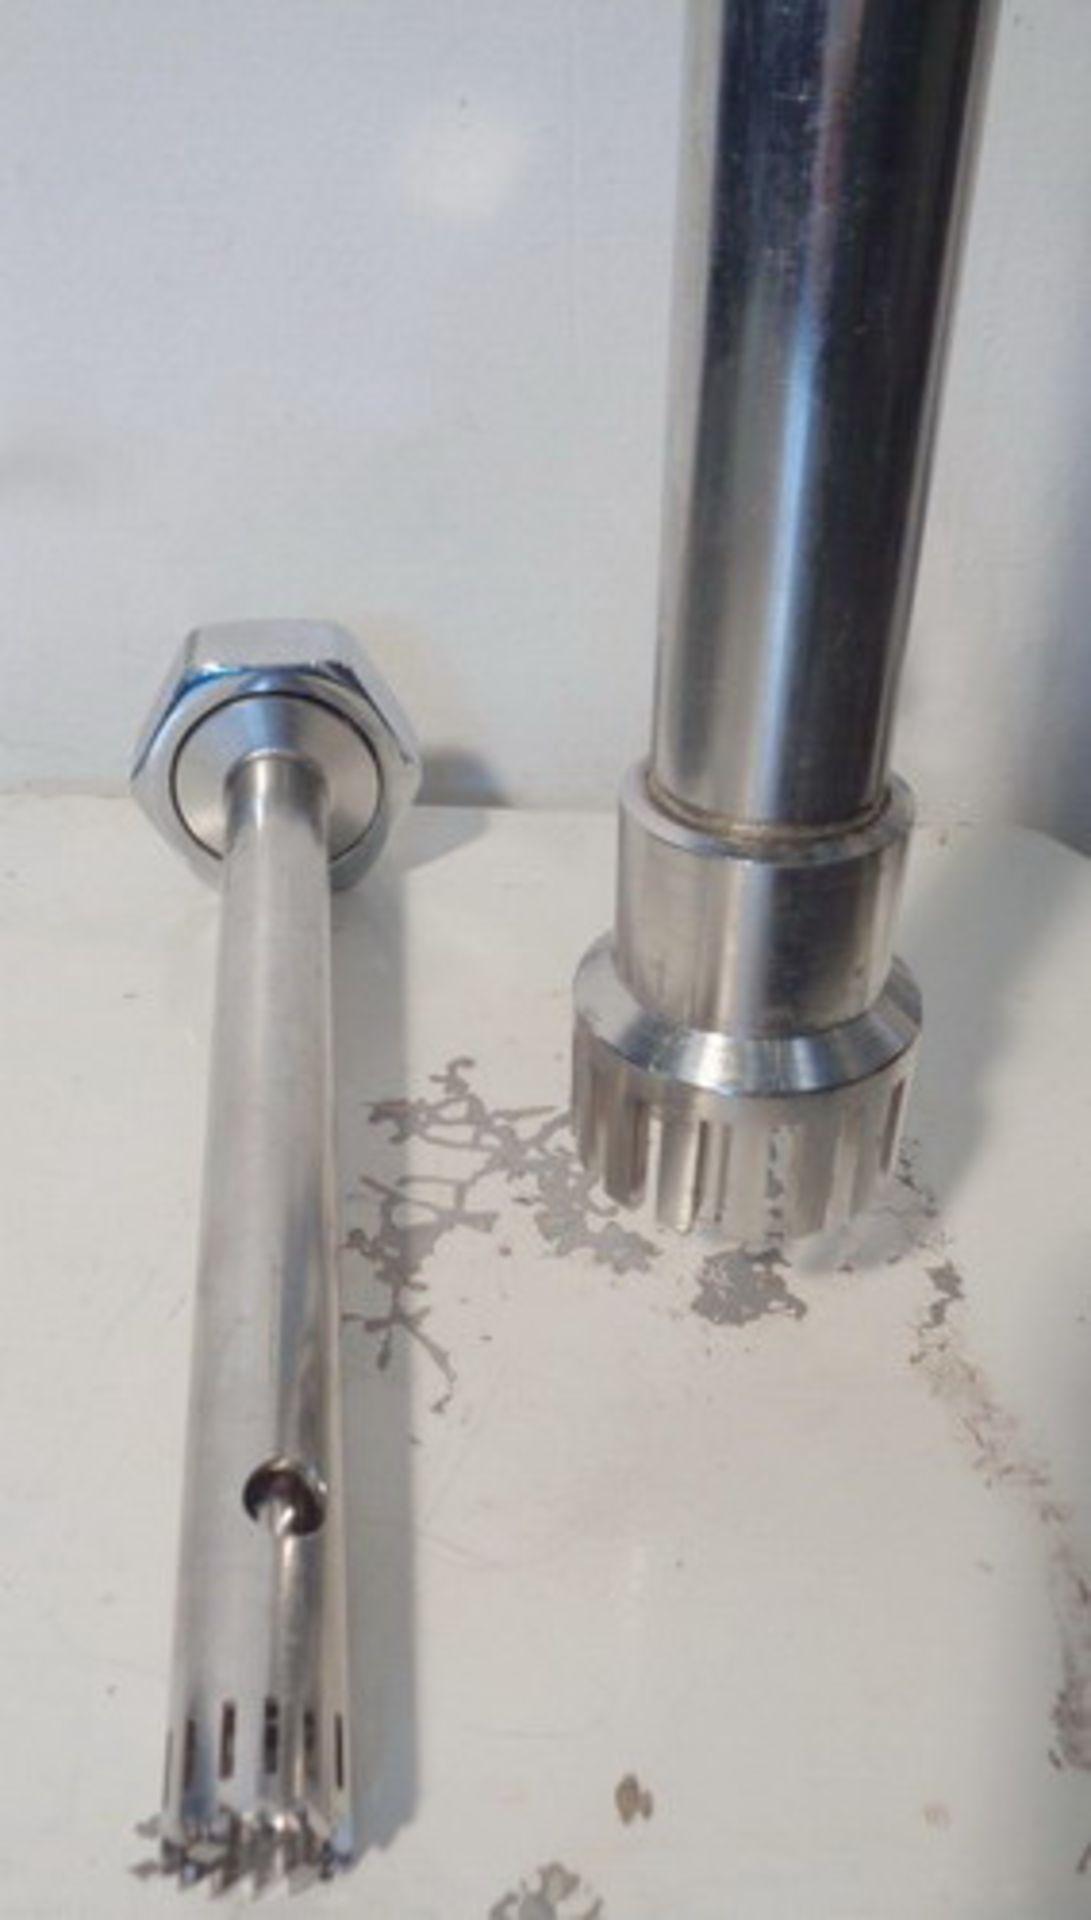 Lot 116 - Brinkman Laboratory Stainless Steel High Speed Homomixer, Model PT45/80, S/N 88348